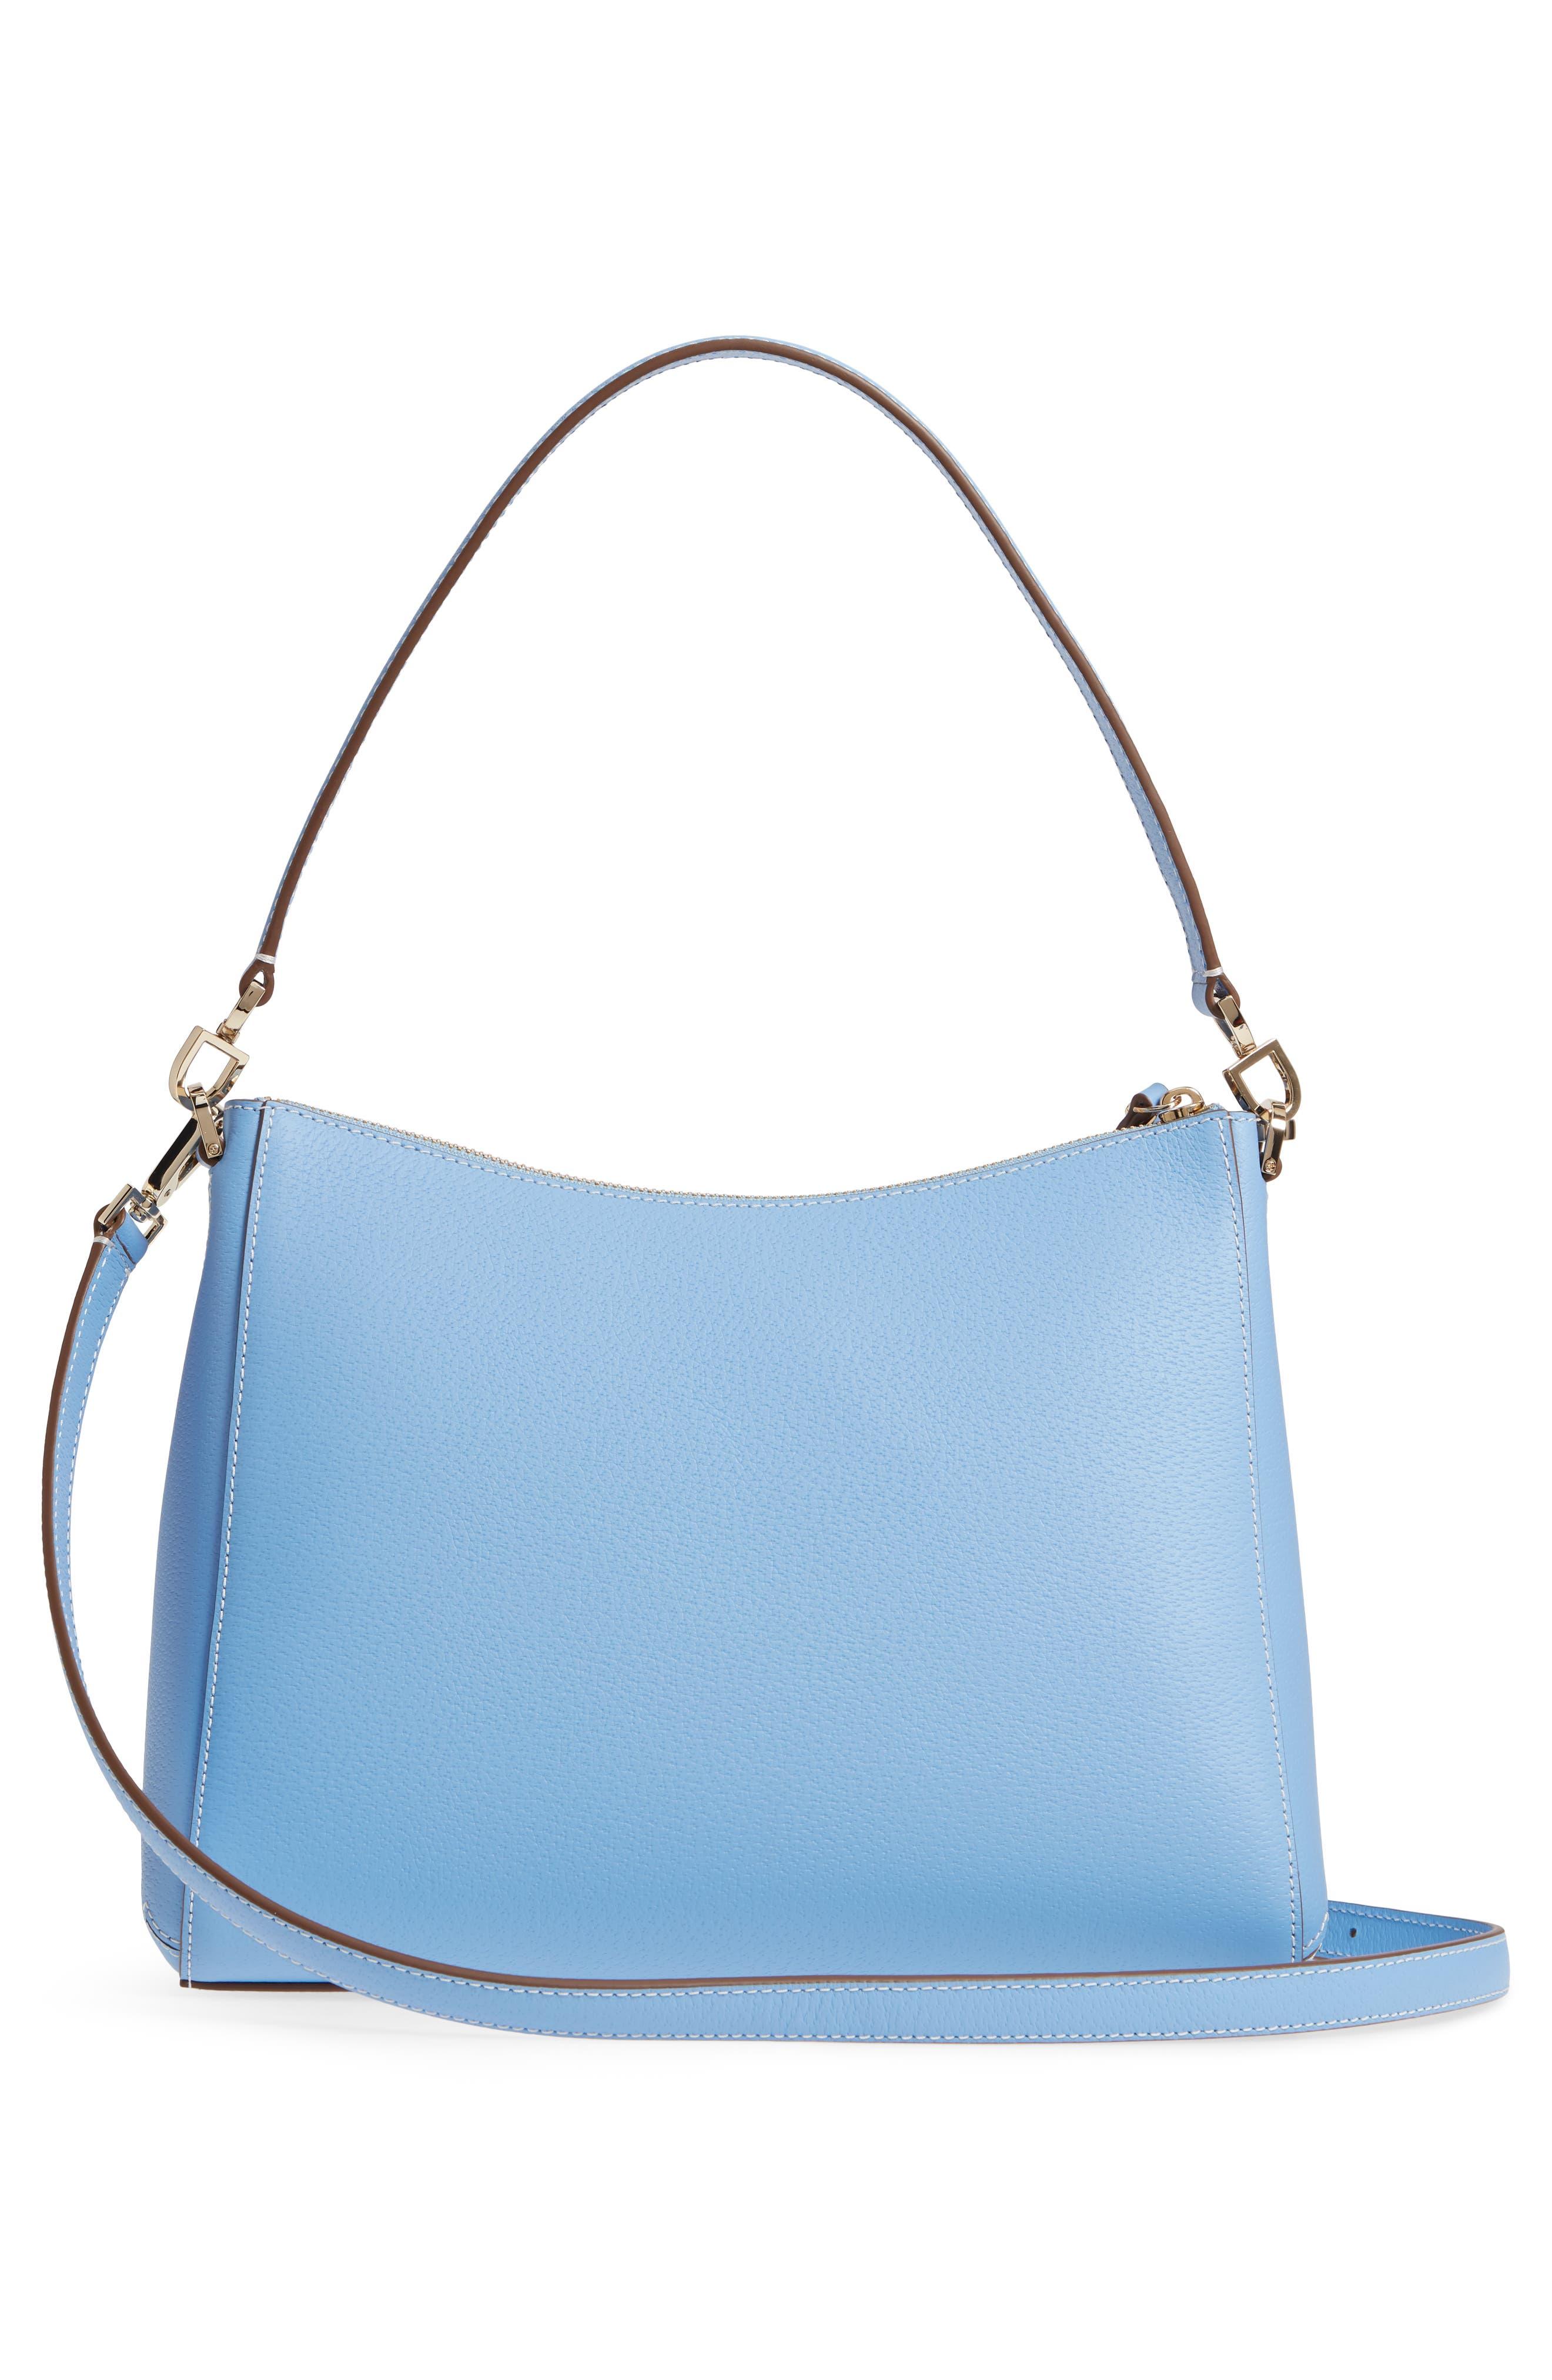 thompson street - marti leather shoulder/crossbody bag,                             Alternate thumbnail 3, color,                             Fable Blue